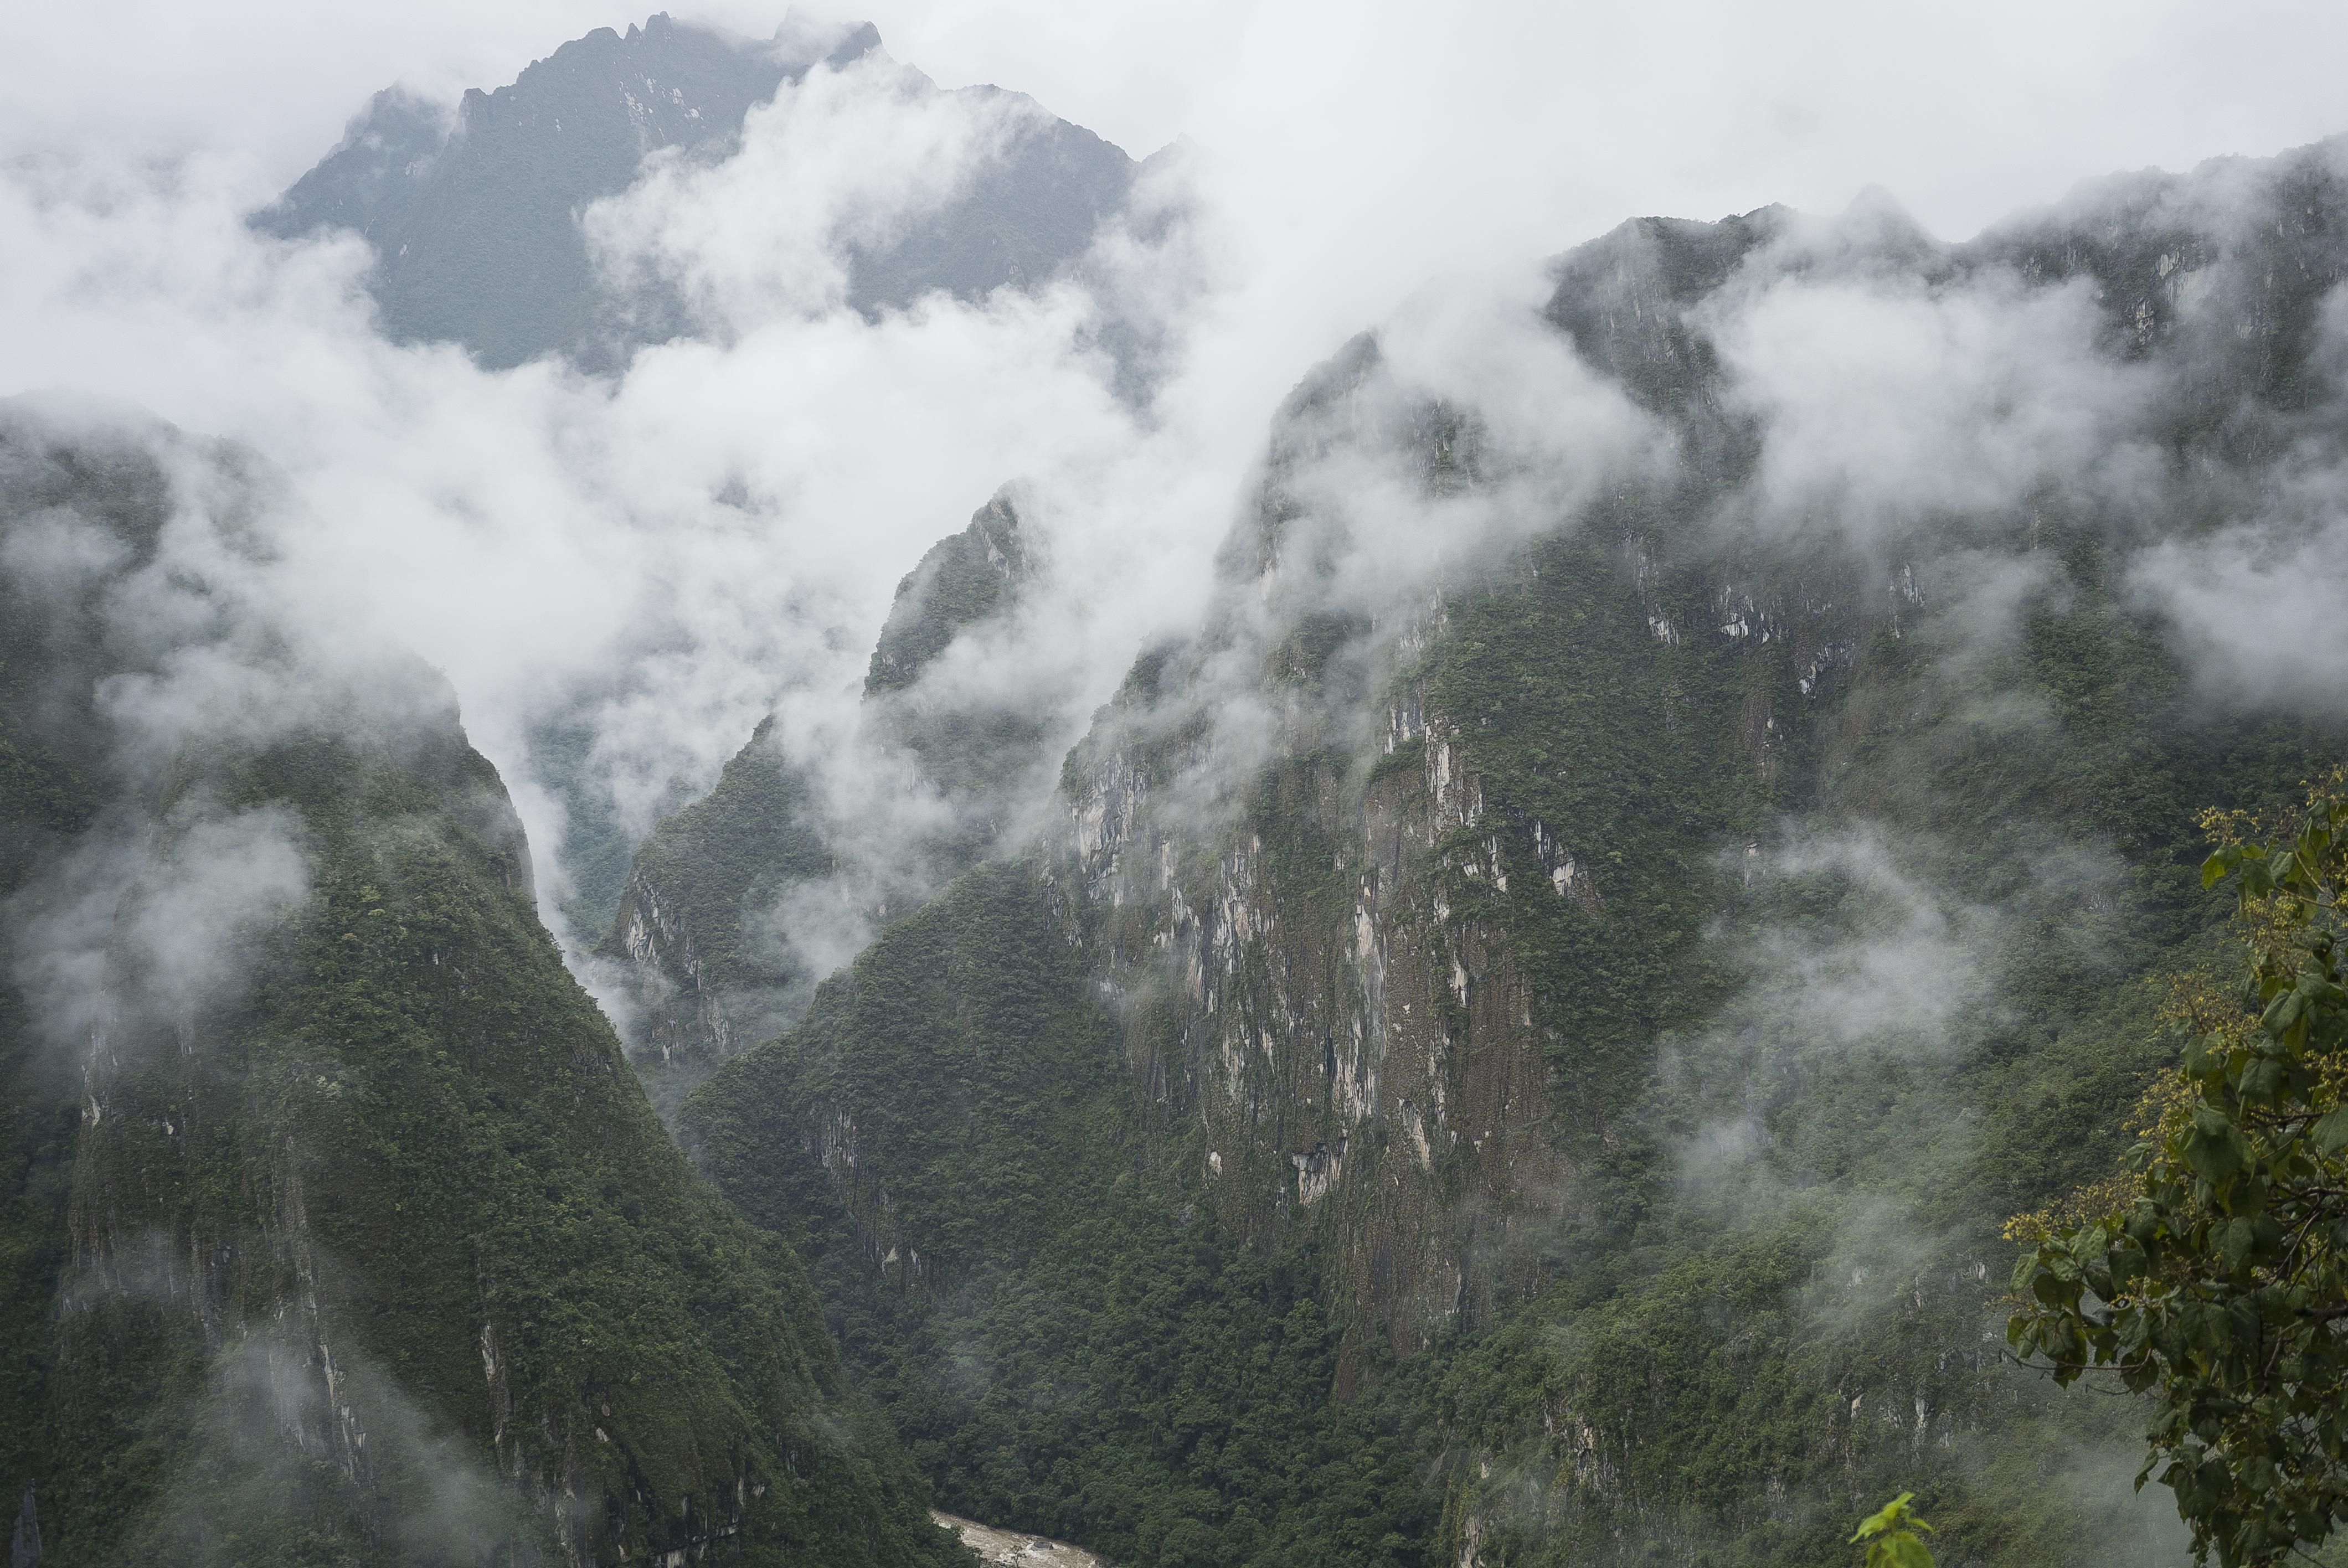 Machu Picchu Mountains in Haze copy.jpg